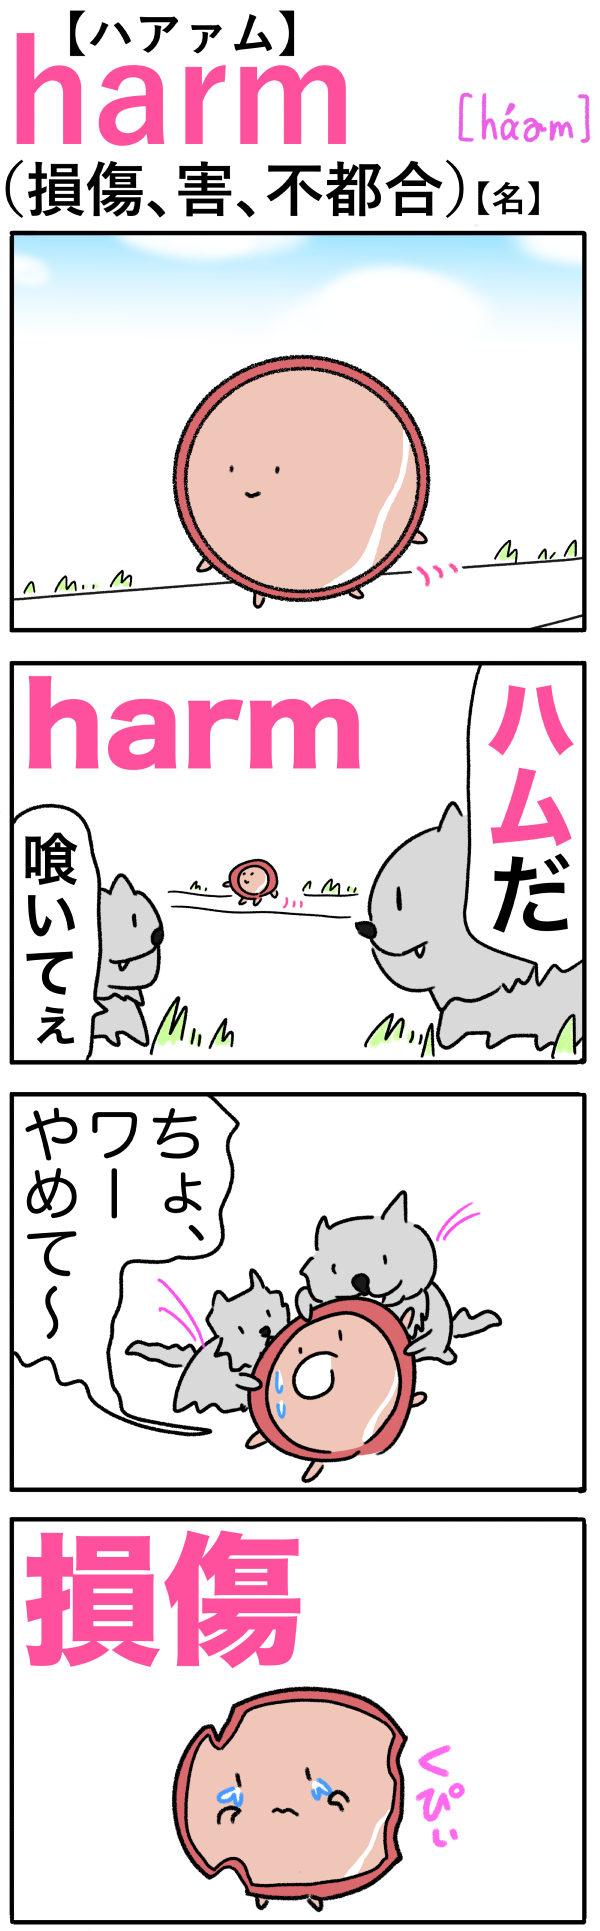 harm(損傷)の語呂合わせ英単語